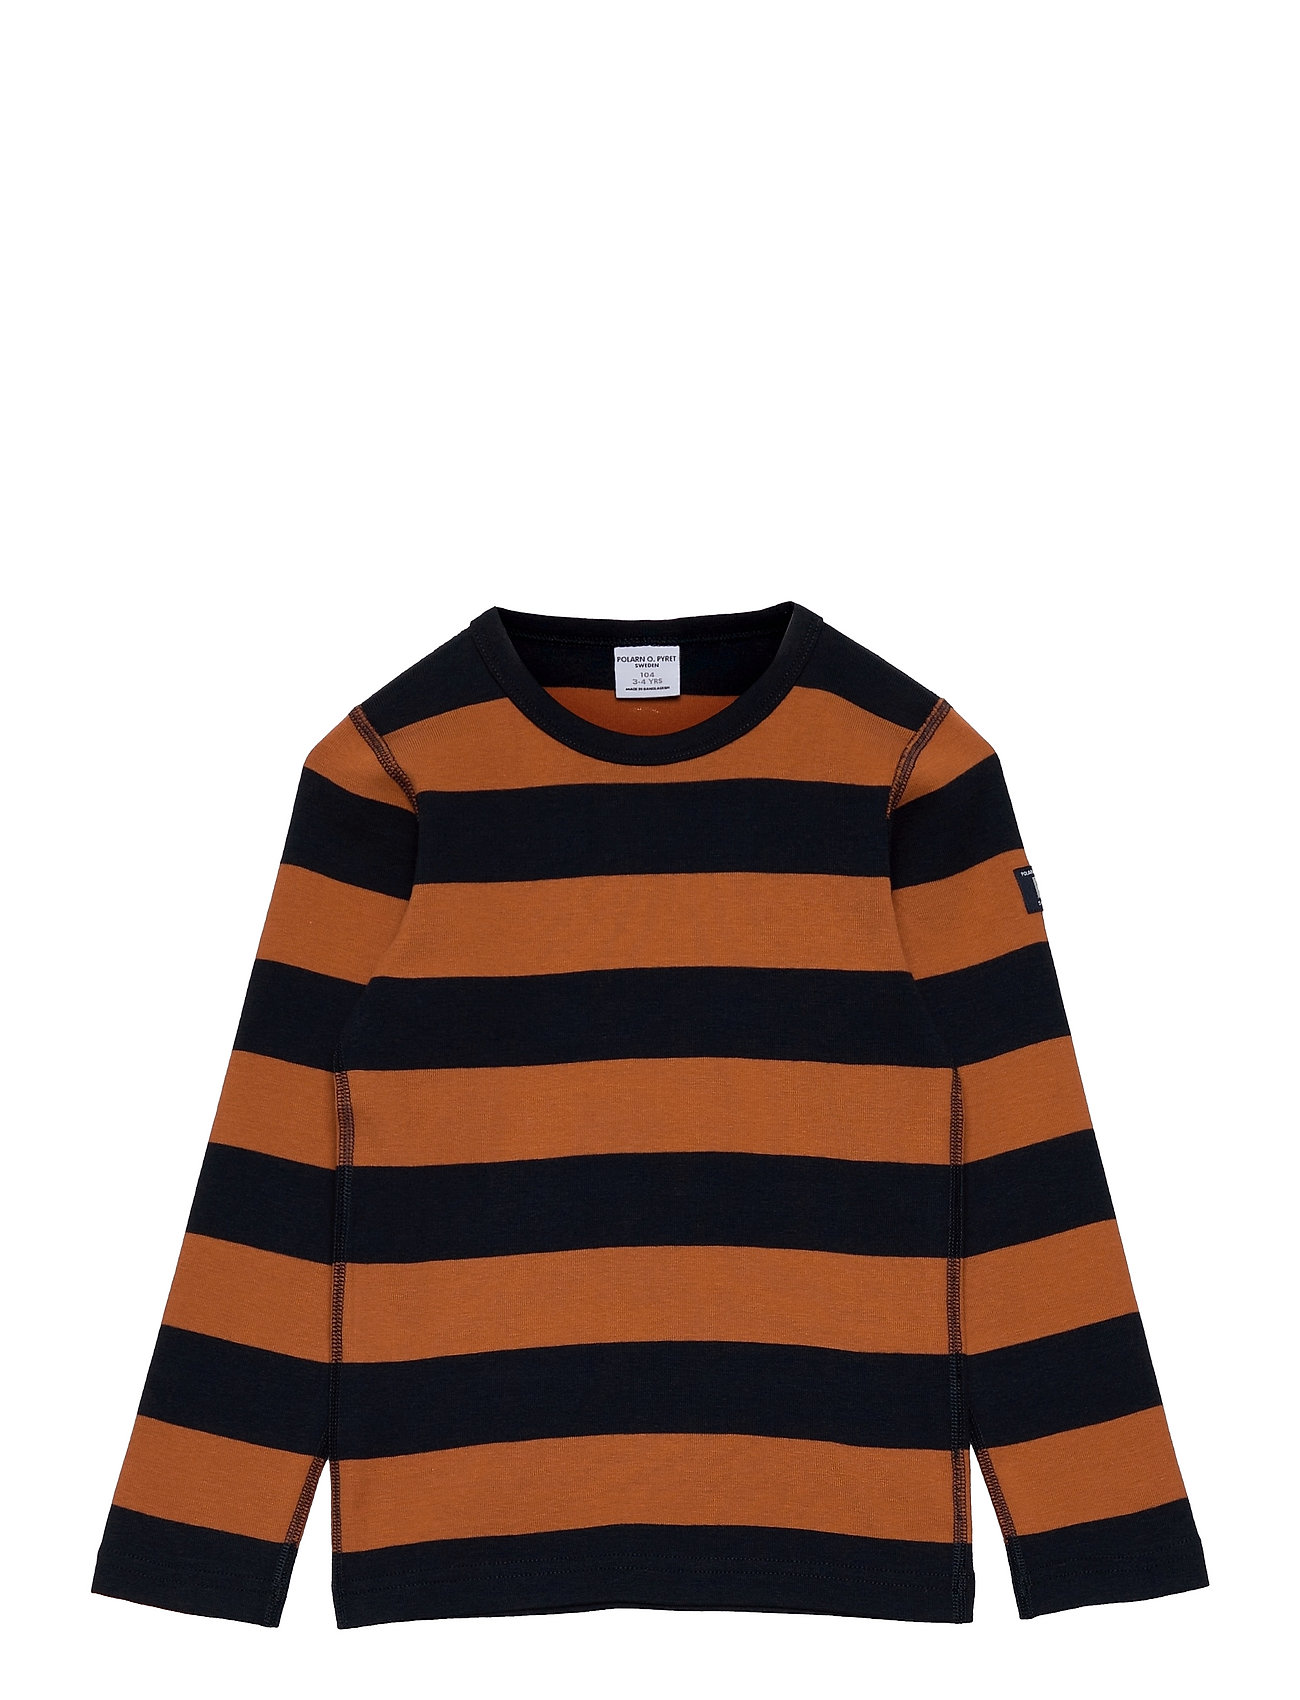 T-Shirt L/S Stripe Preschool Langærmet T-shirt Blå Polarn O. Pyret